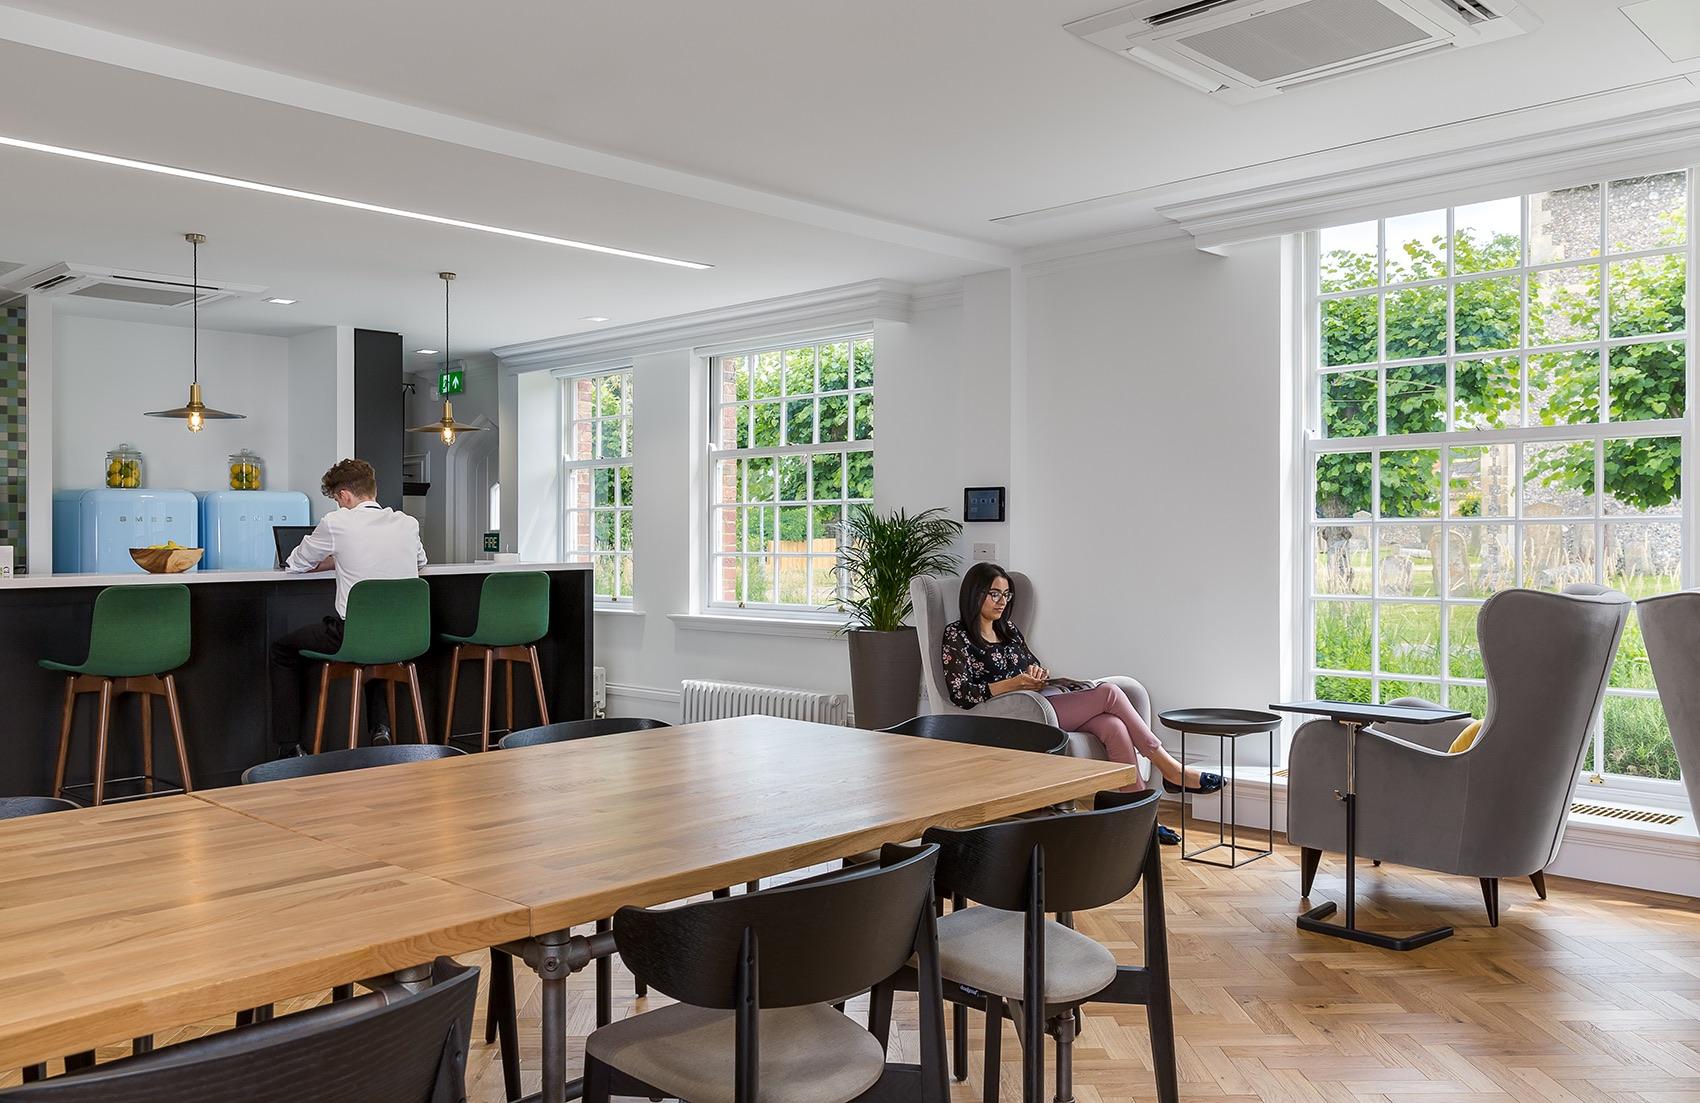 halma-amersham-office-16